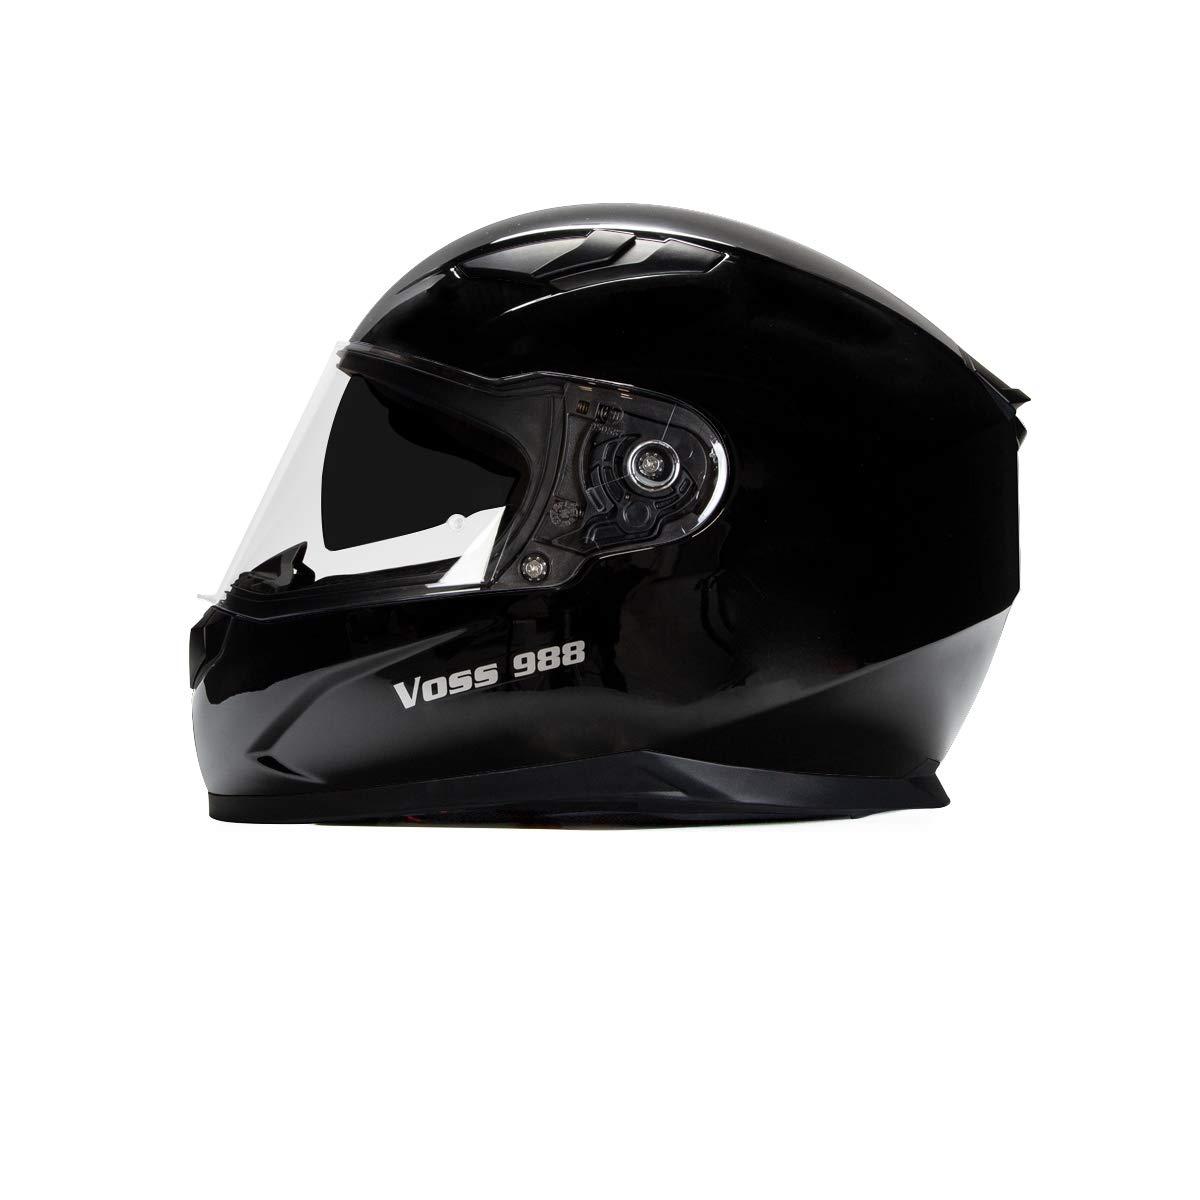 Voss 988 Moto-1 Street Full Face Helmet with Drop Down Internal Sun Lens - L - Solid Gloss Black